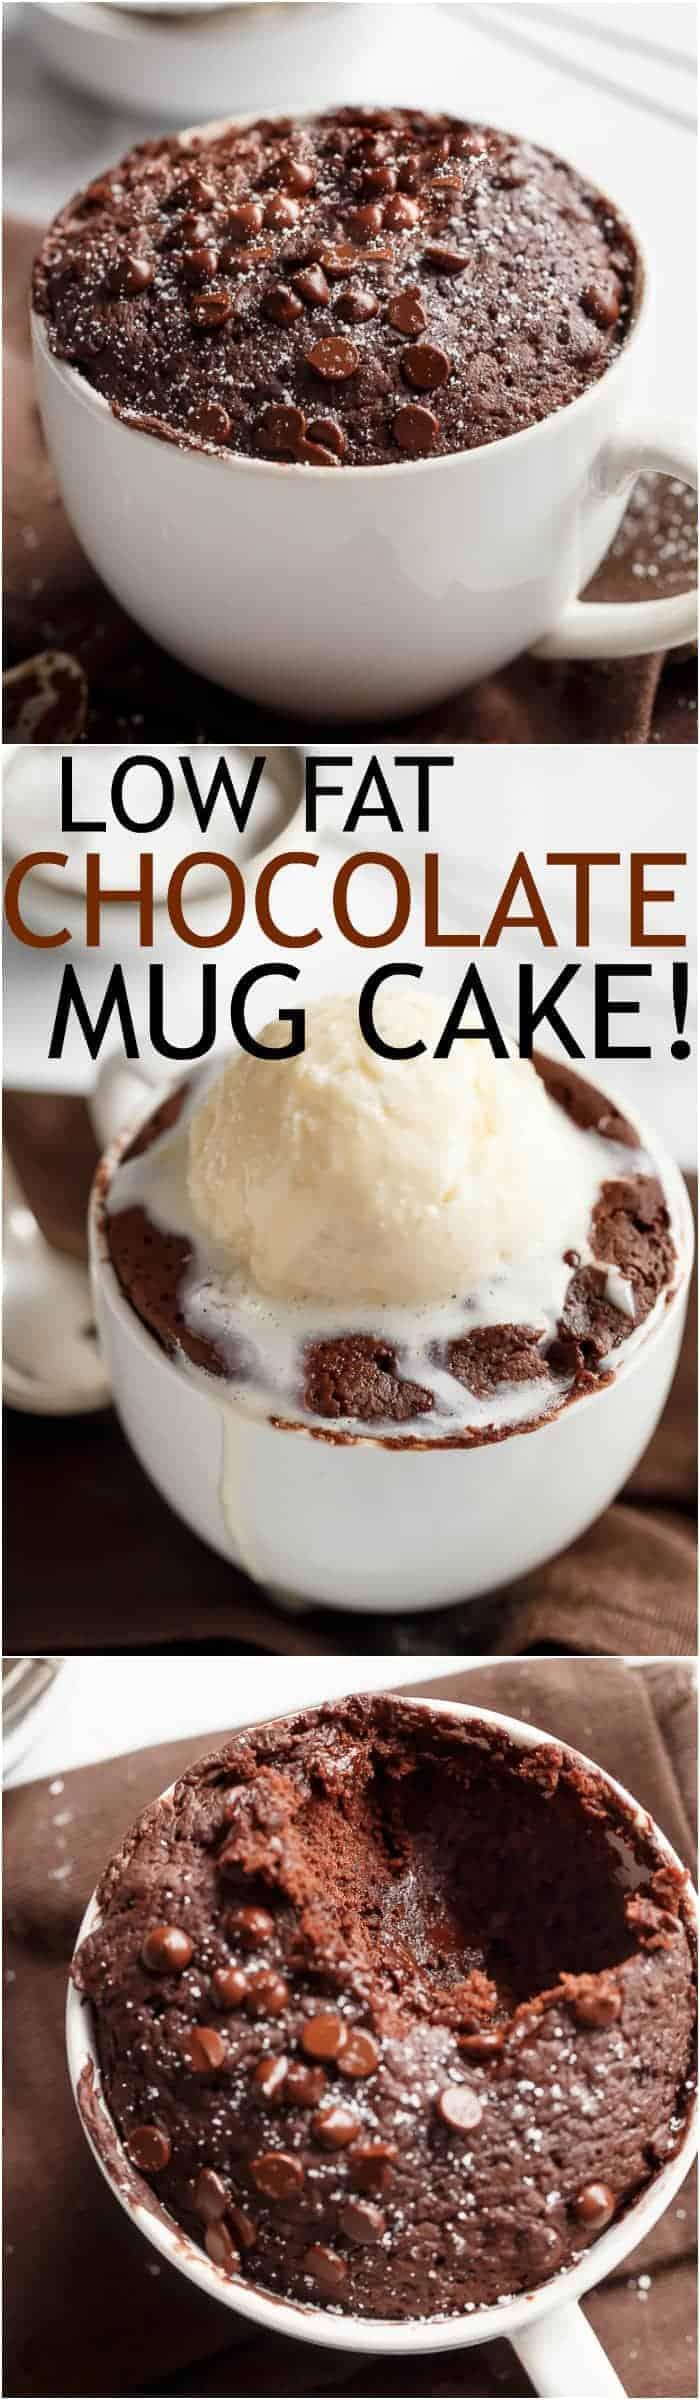 Low Fat Chocolate Mug Cake - Cafe Delites